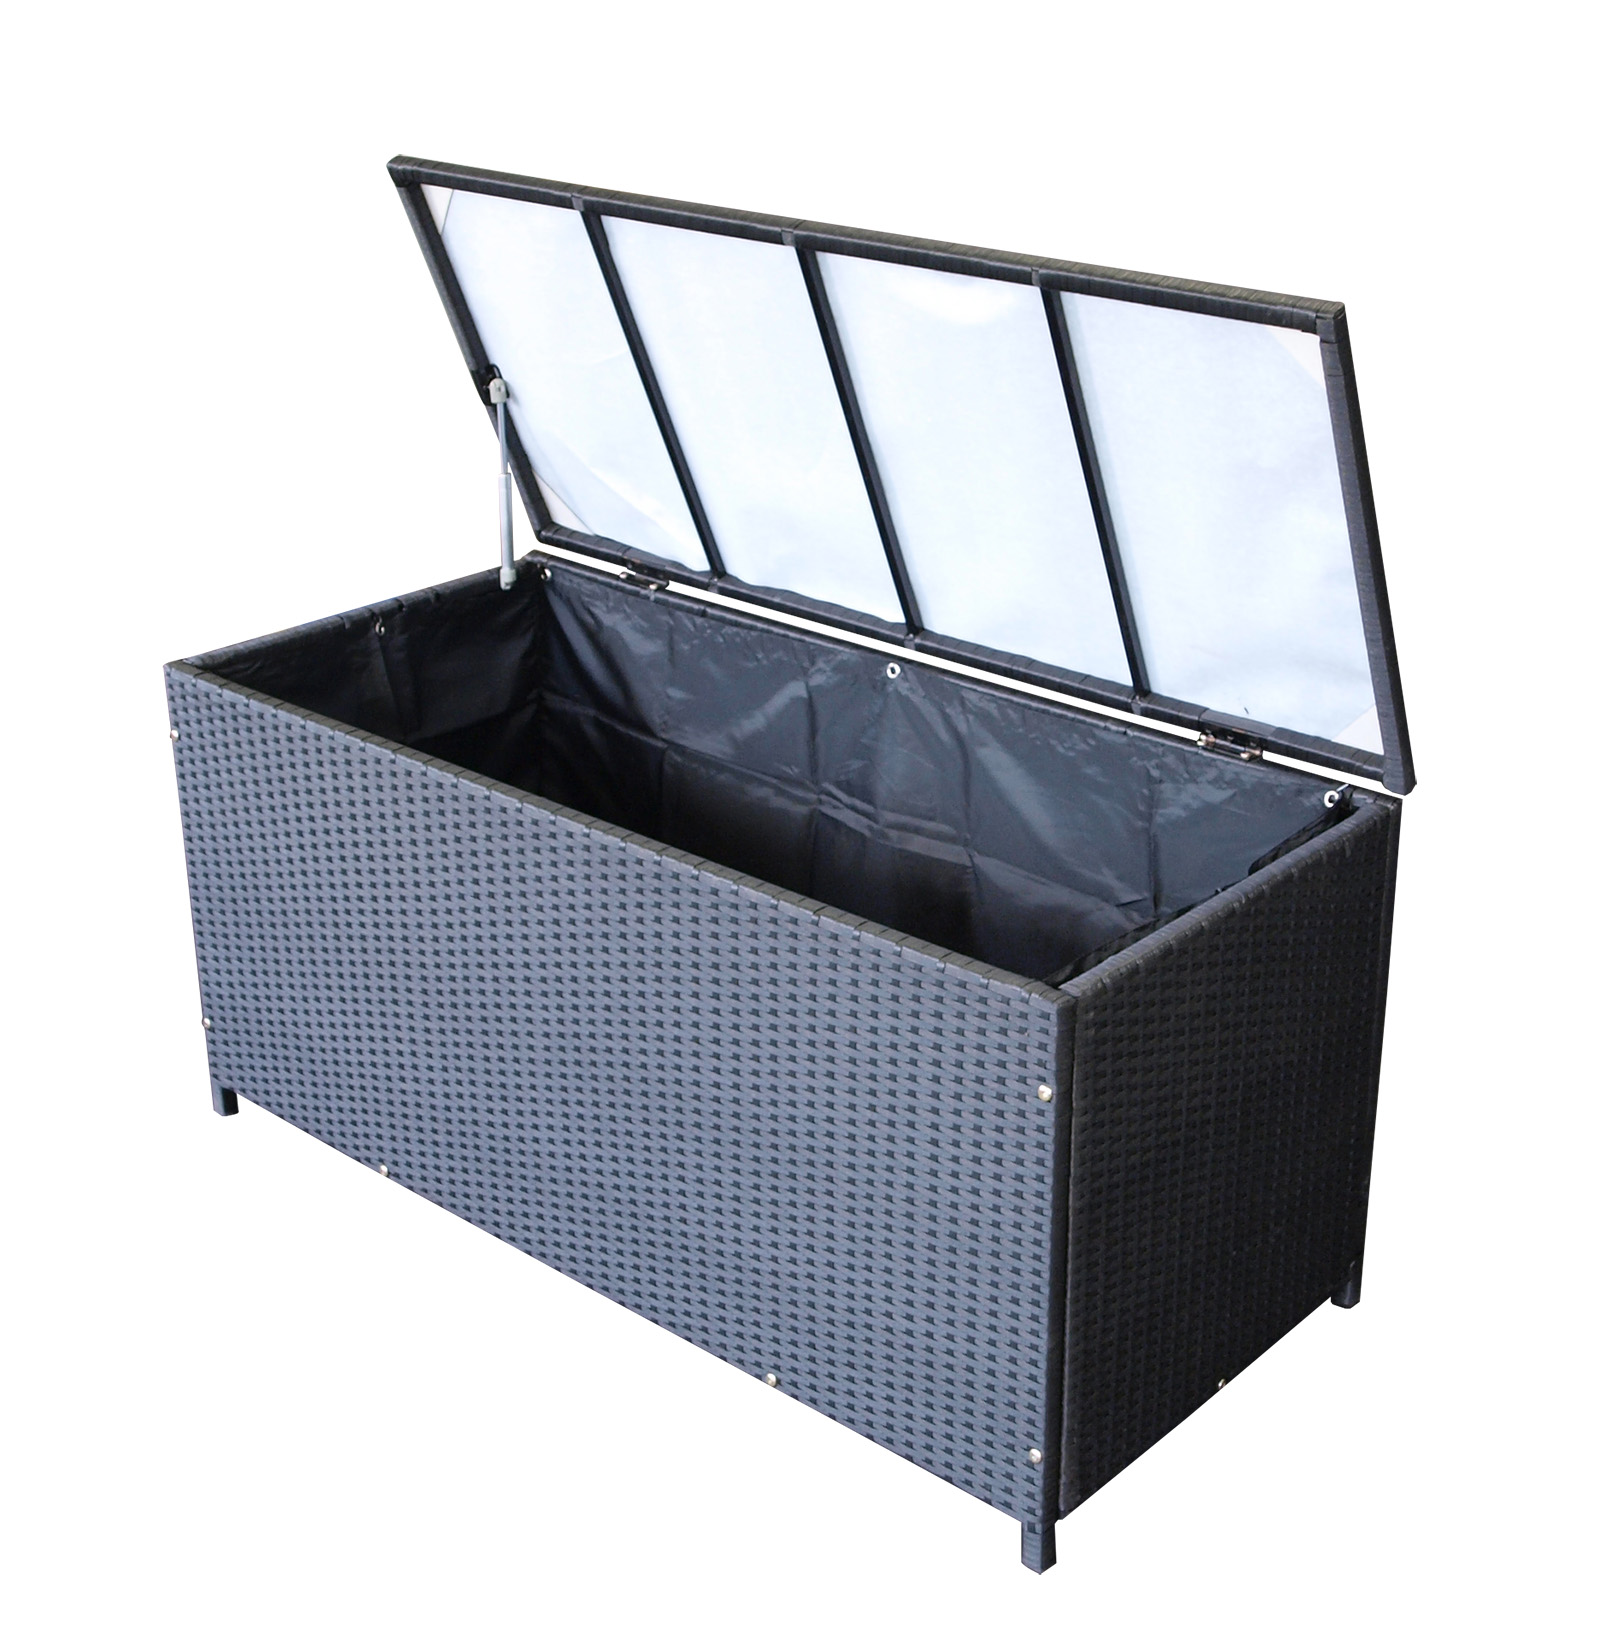 kissenbox auflagenbox kissentruhe gartentruhe 120x54cm rattan schwarz 2 wahl ebay. Black Bedroom Furniture Sets. Home Design Ideas